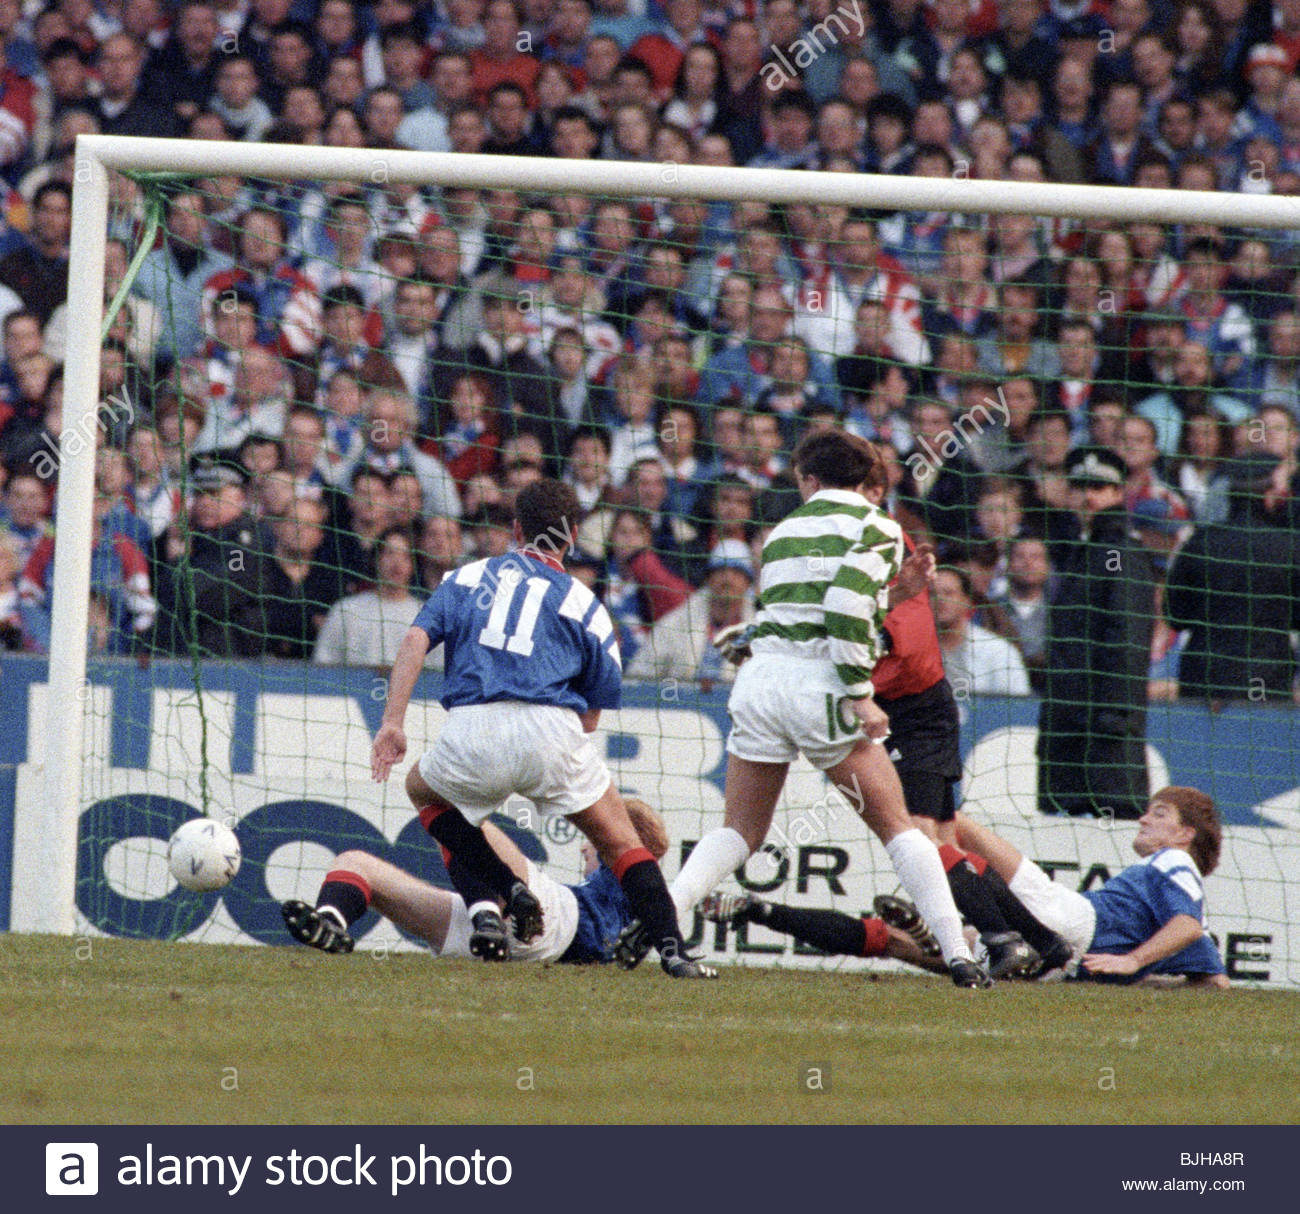 20/03/93 PREMIER DIVISION CELTIC V RANGERS (2-1) CELTIC PARK - GLASGOW The Rangers defence is helpless as the ball - Stock Image